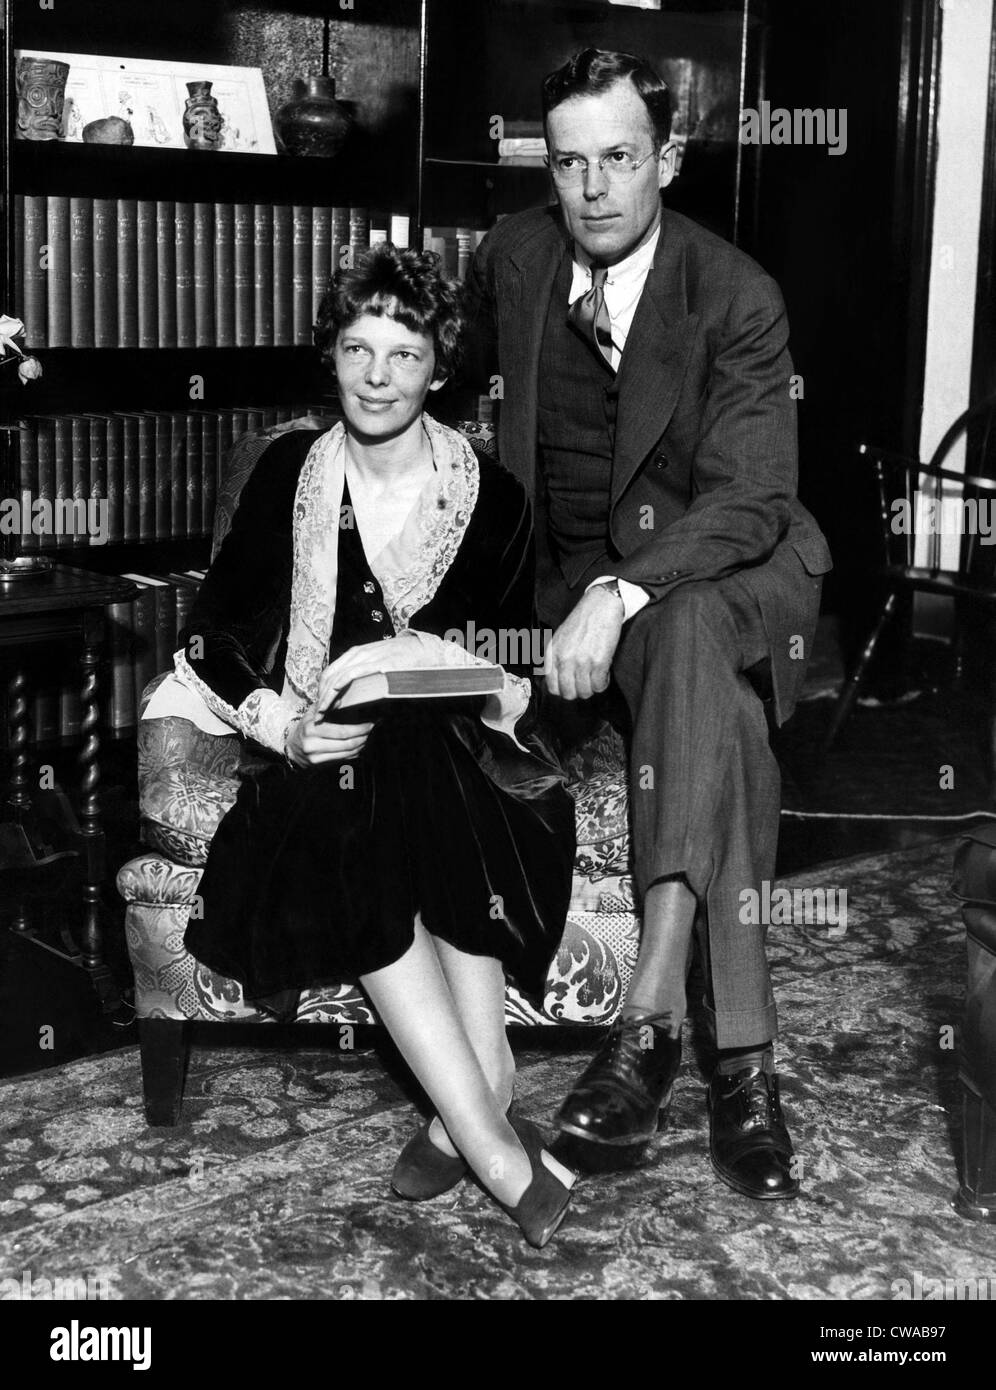 Who Was Amelia Earhart Married To